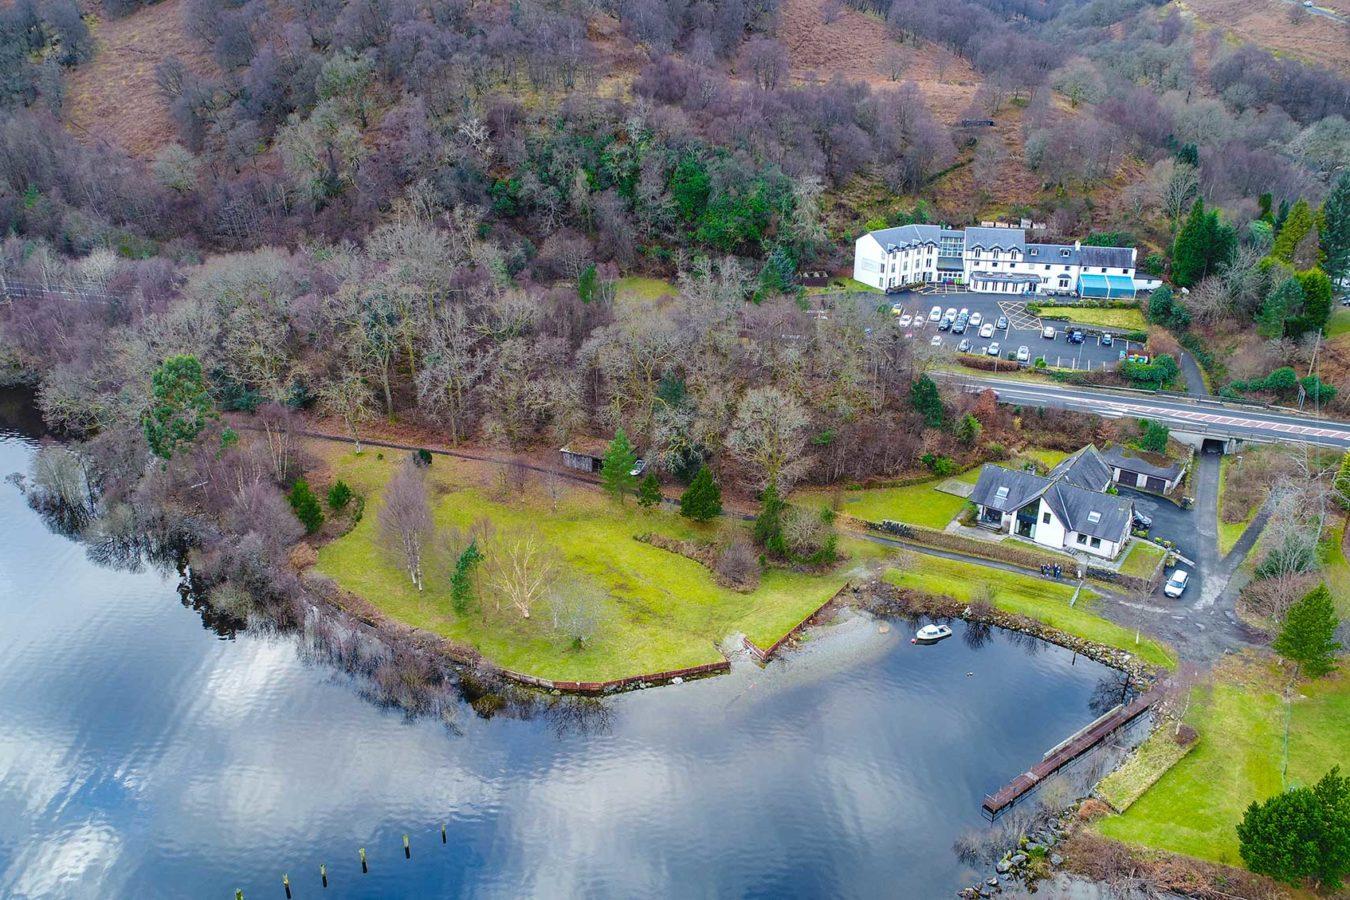 The-Inn-on-Loch-Lomond-Drone-Photo